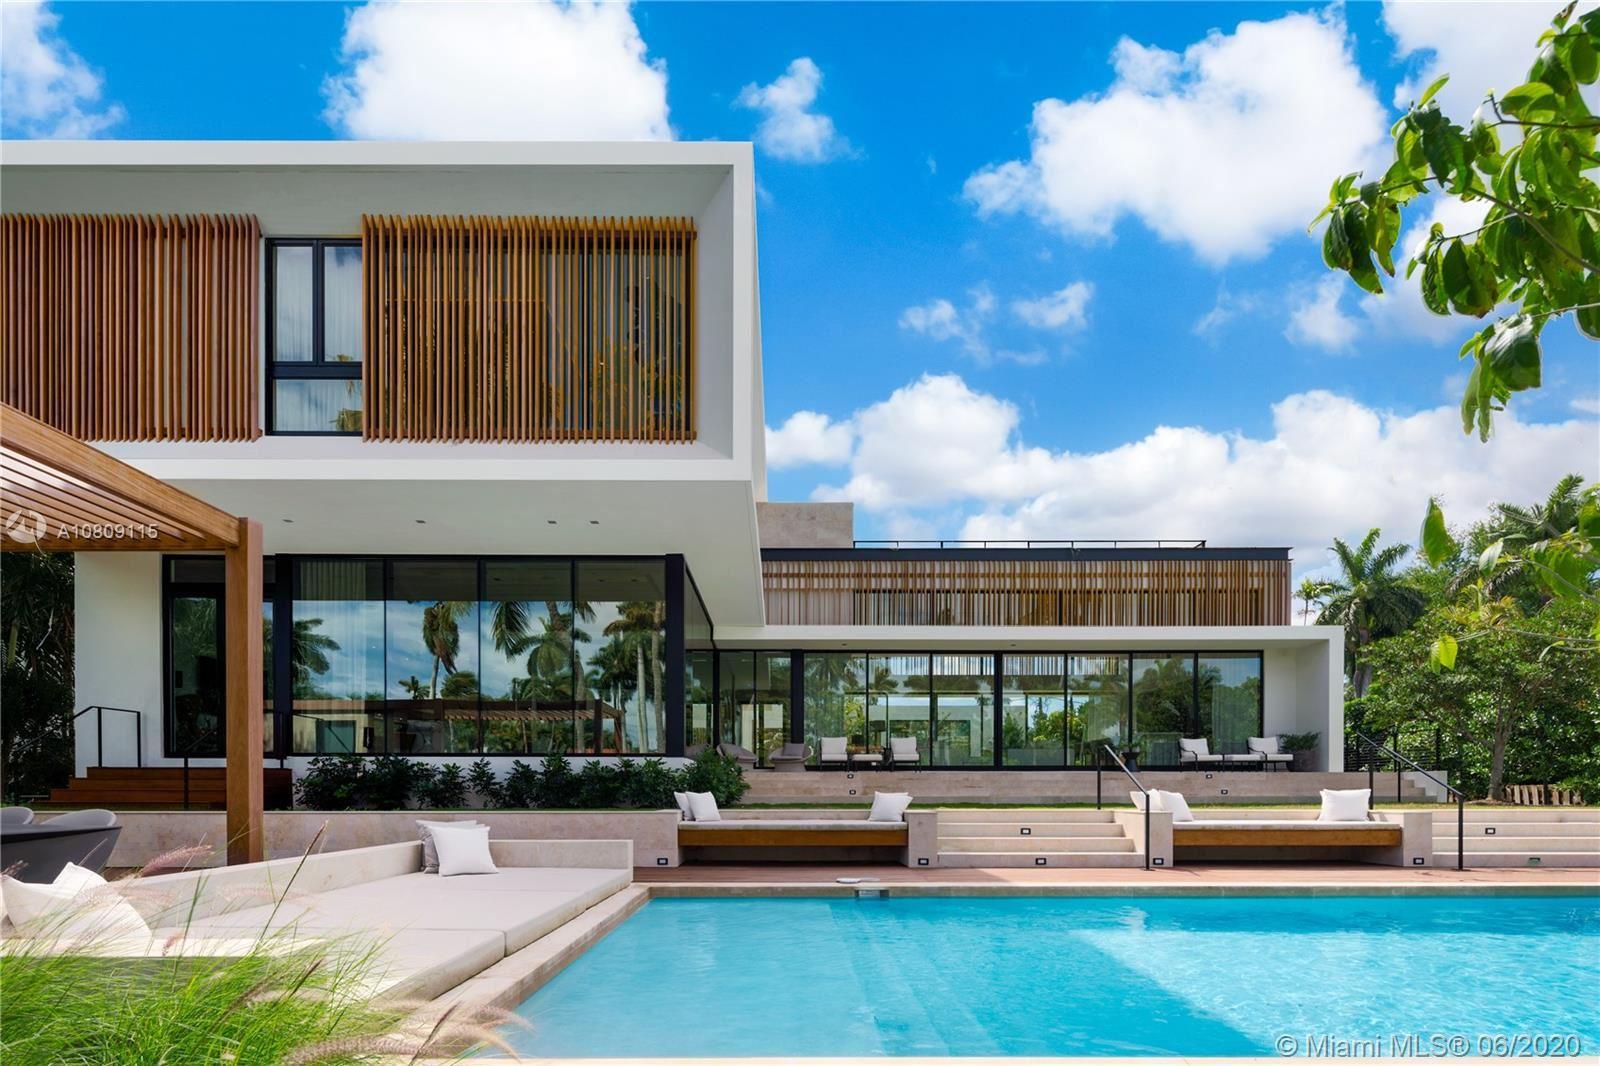 Photo 43 of Listing MLS a10809115 in 1635 W 22nd St Miami Beach FL 33140